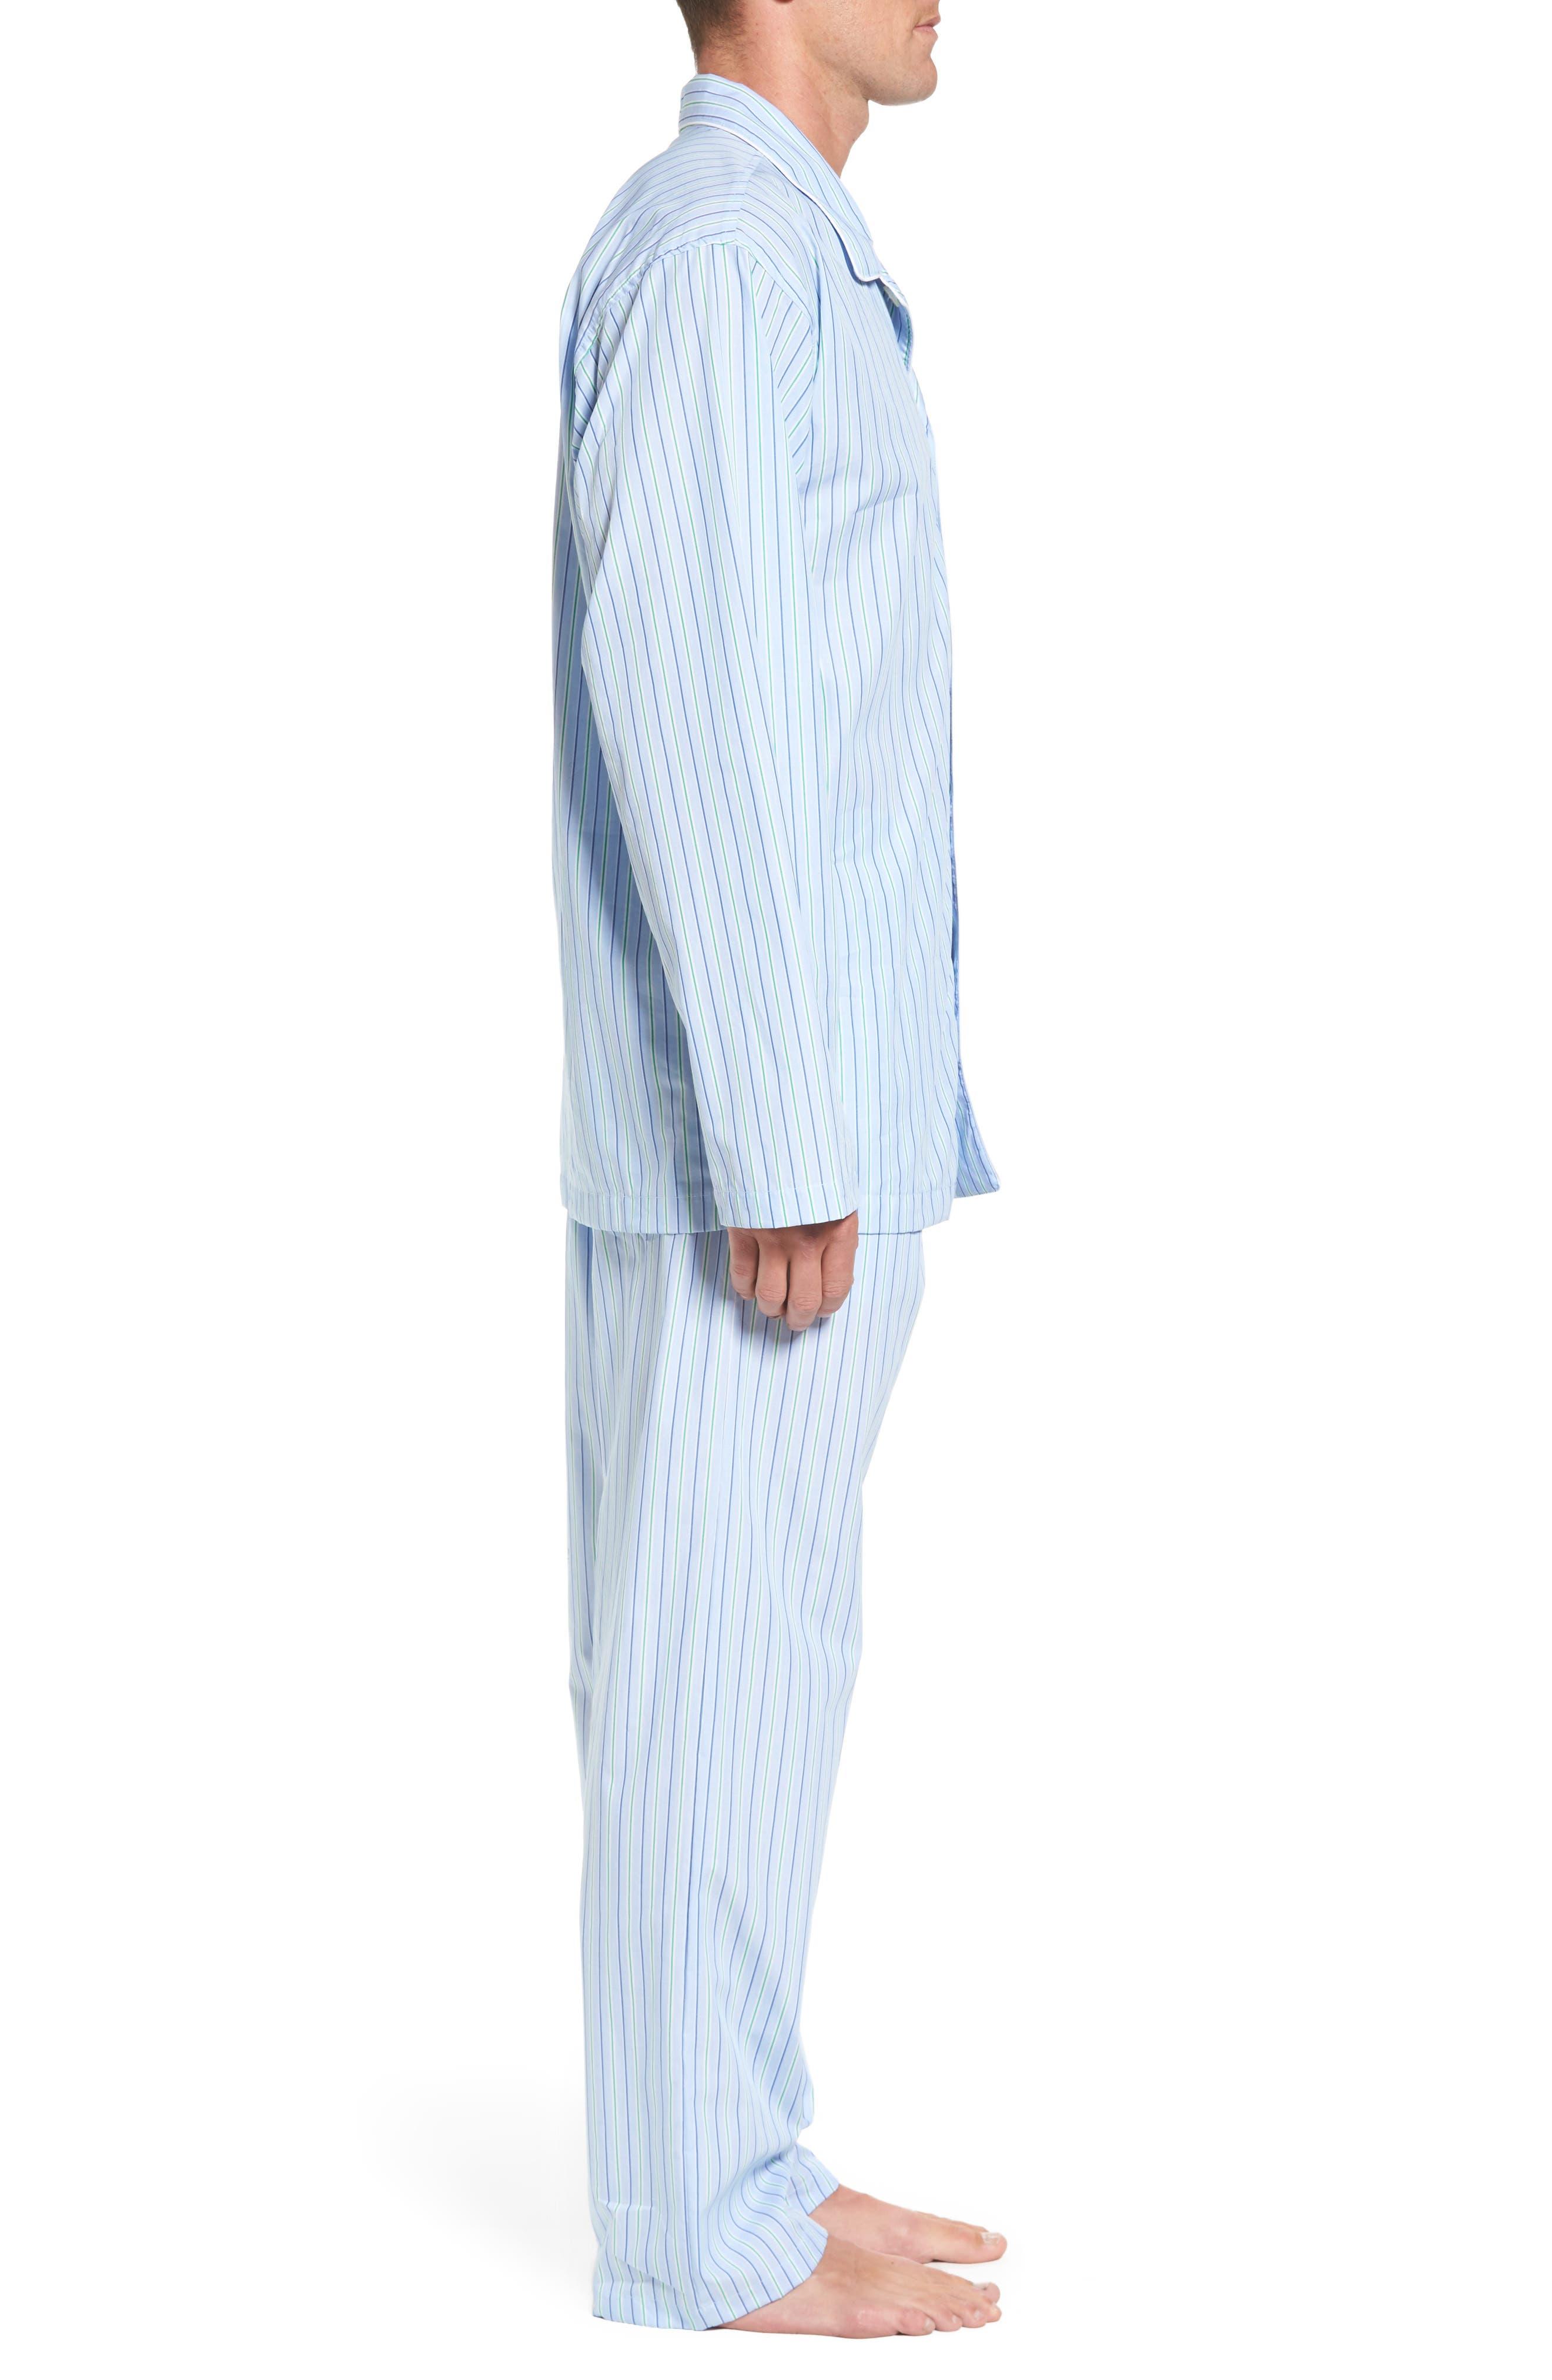 Cotton Pajama Top,                             Alternate thumbnail 3, color,                             BARI STRIPE